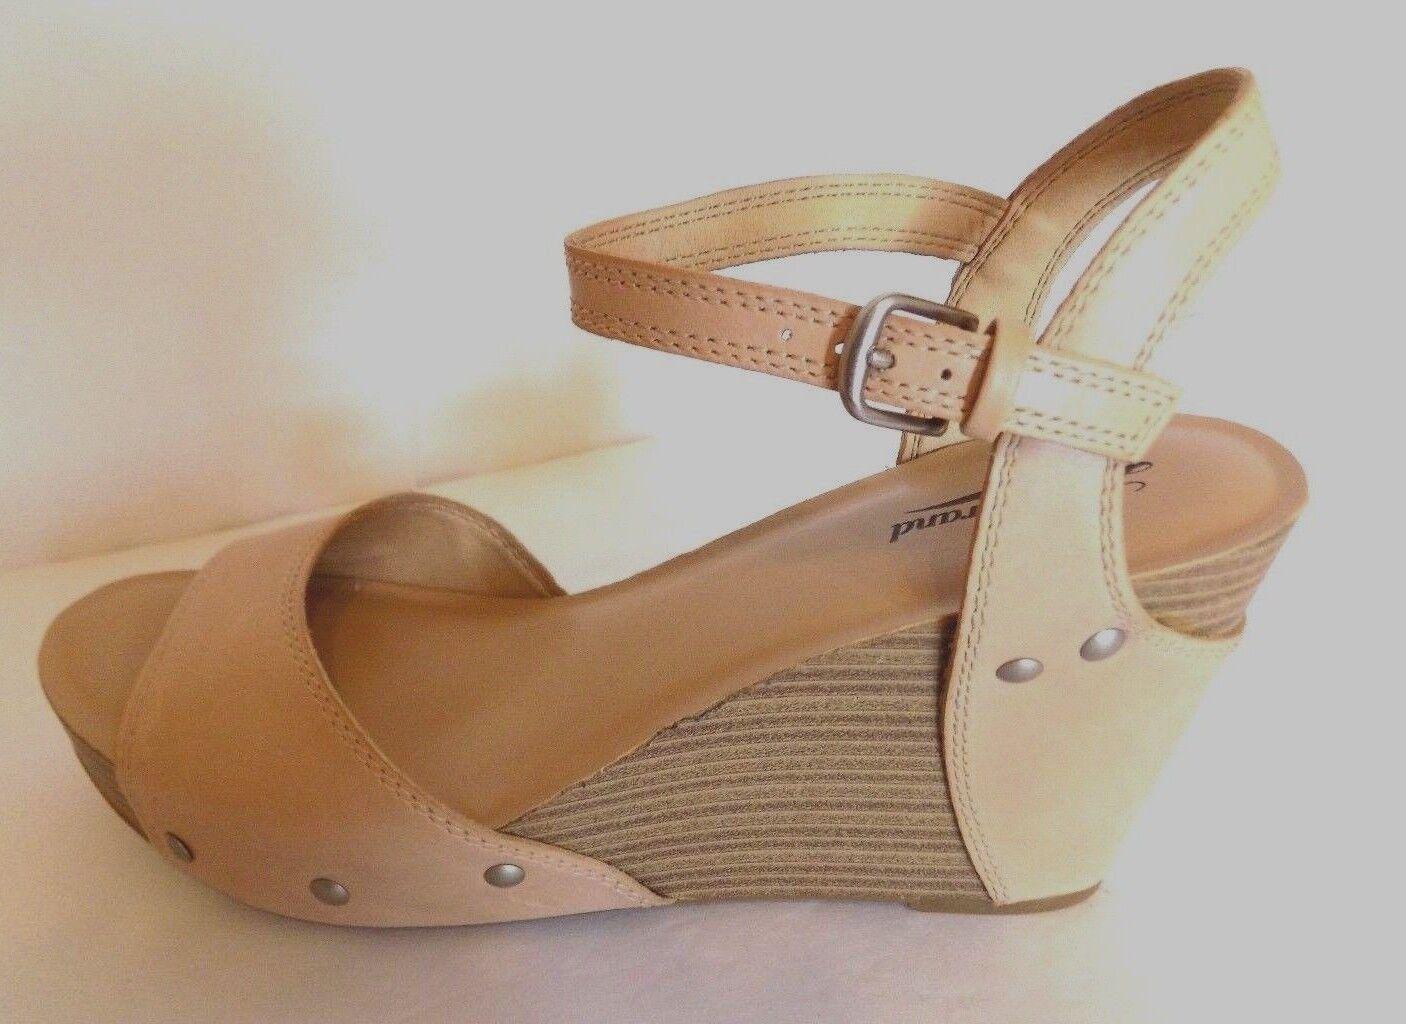 Lucky Brand Marshha Tan Leather Open Toe Toe Toe Ankle Strap 4  Wedge Sandal SZ 10 M 4cddcd